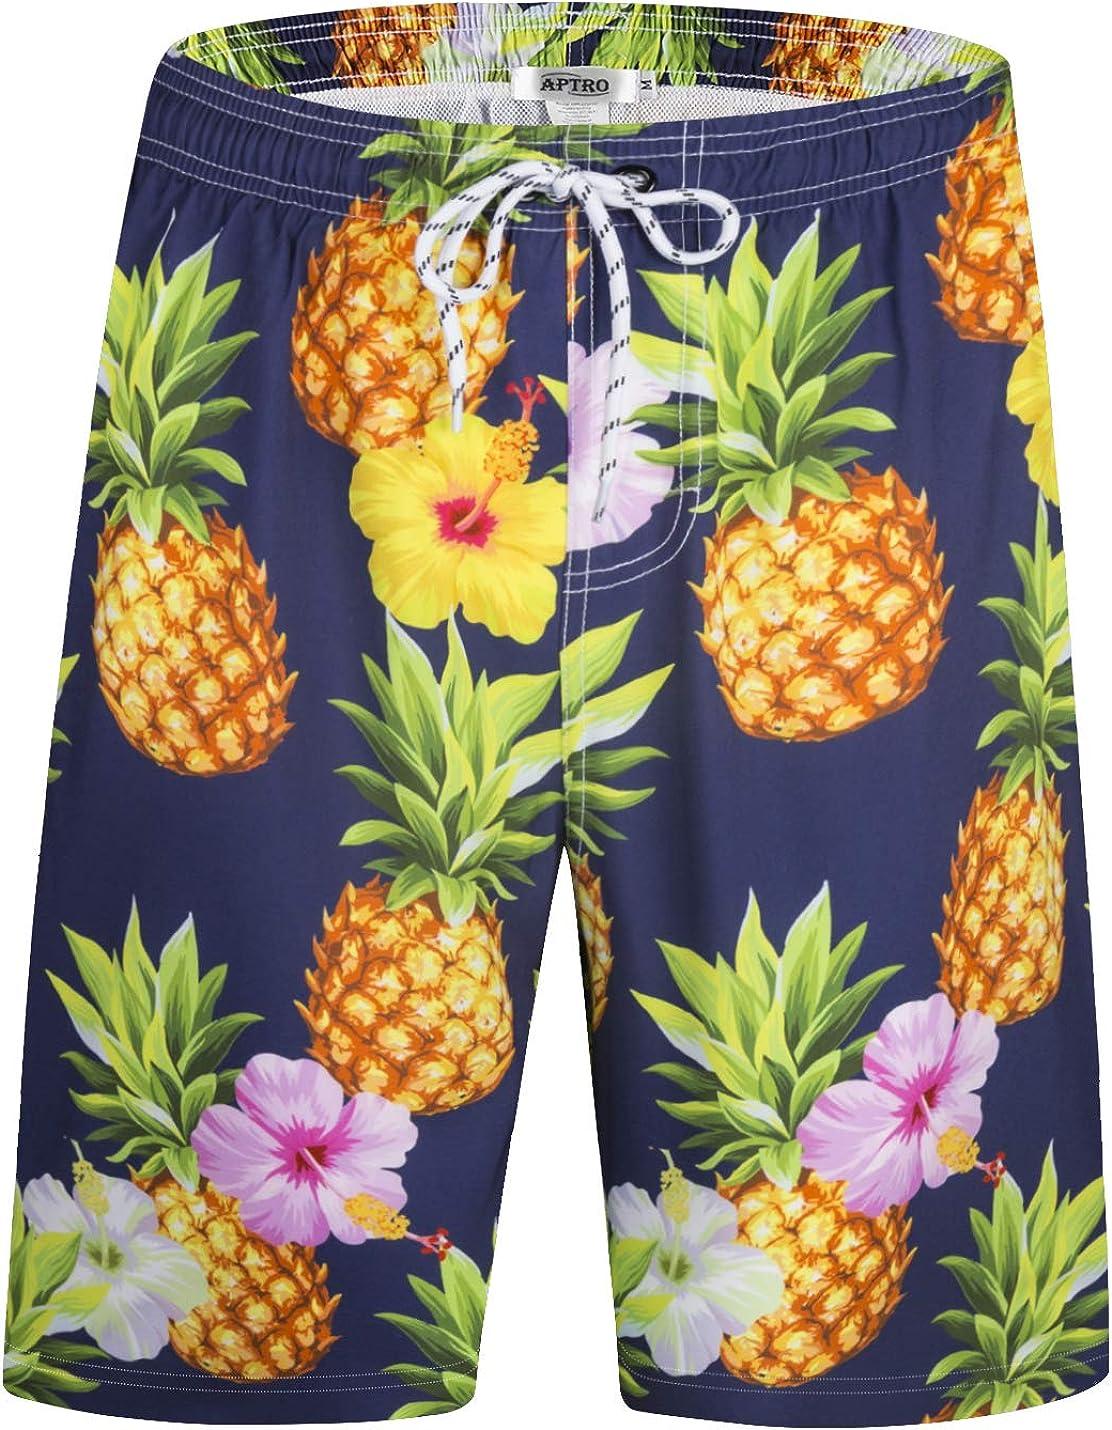 APTRO Mens Shorts Swim Trunks Casual Surf Beach Shorts Quick Dry Board Shorts 01